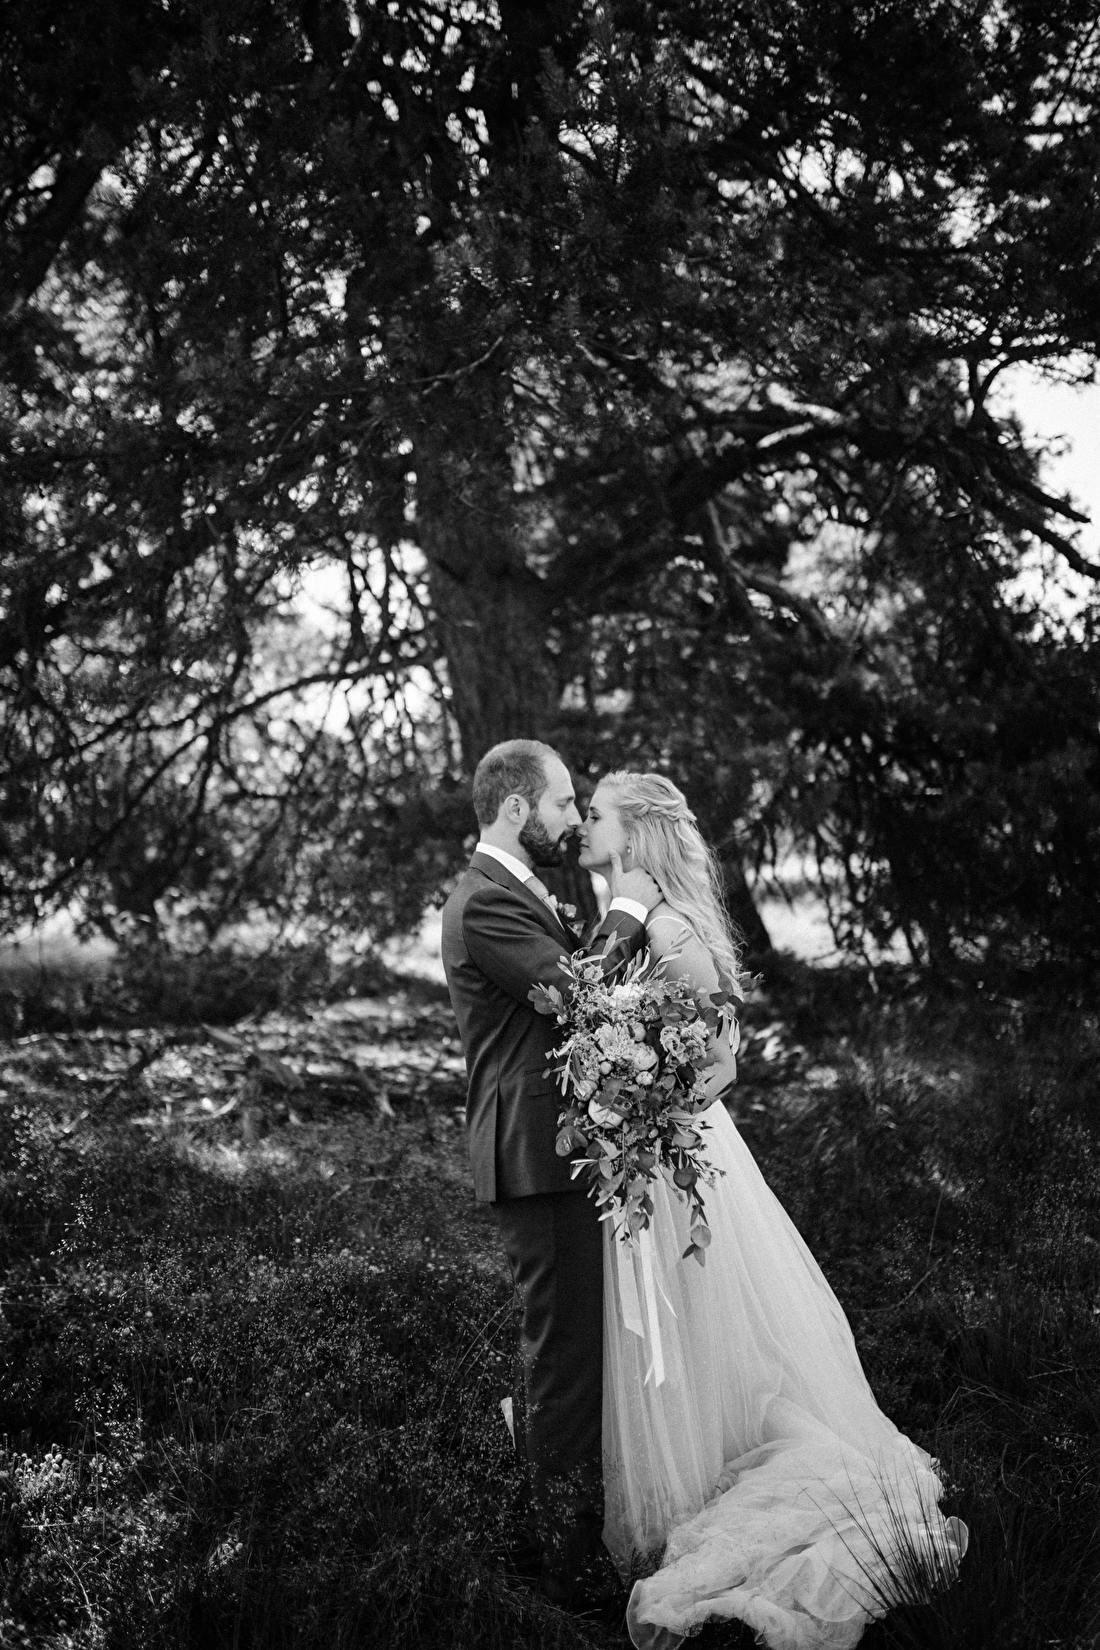 Bruidsboeket - Suzanne-barneveld-bloomed-samen